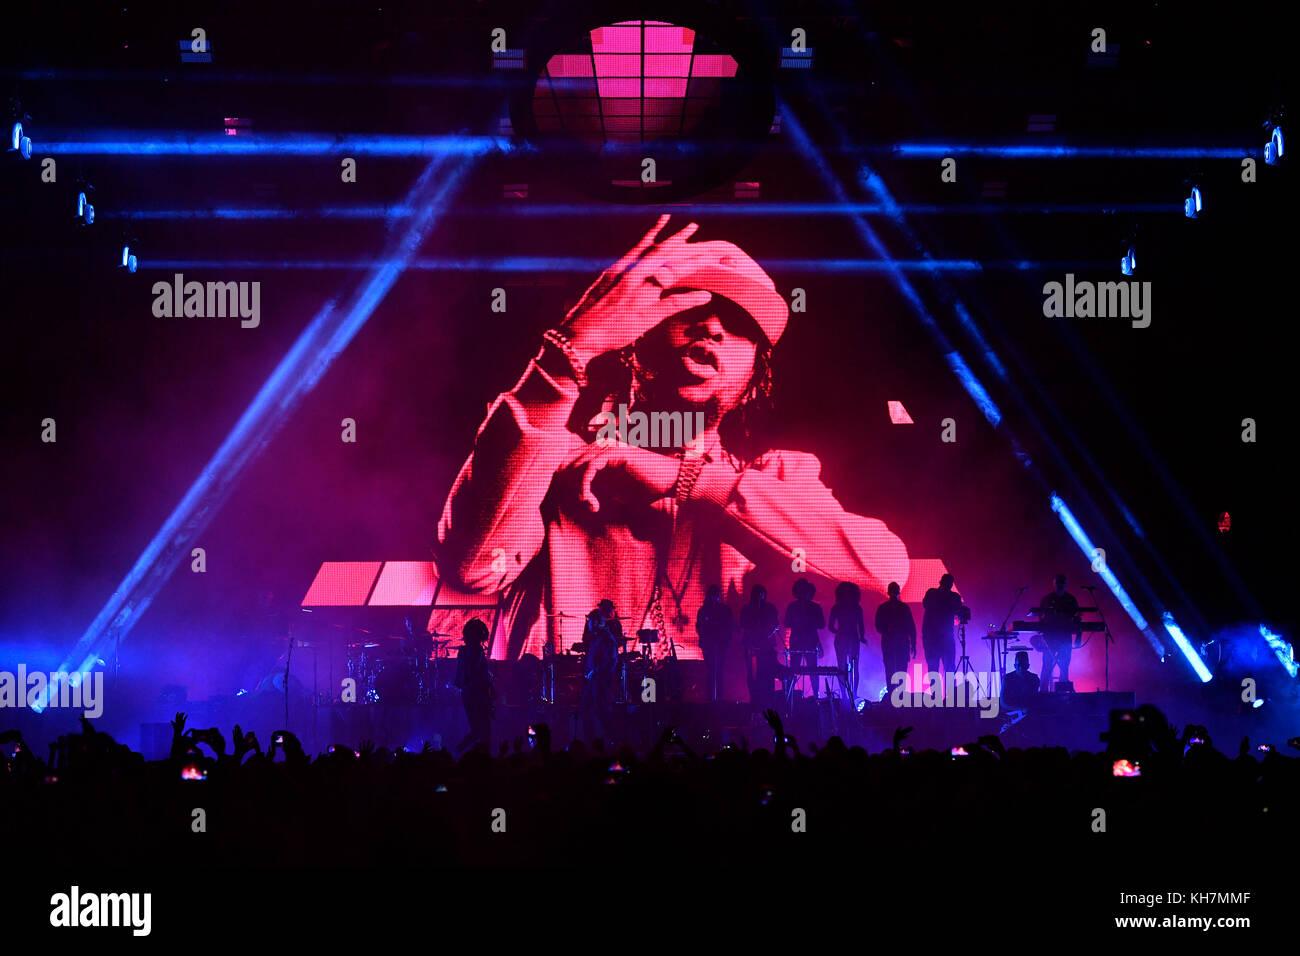 Prague, Czech Republic. 14th Nov, 2017. Pop hip hop band Gorillaz perform during the concert in Prague, Czech Republic, Stock Photo